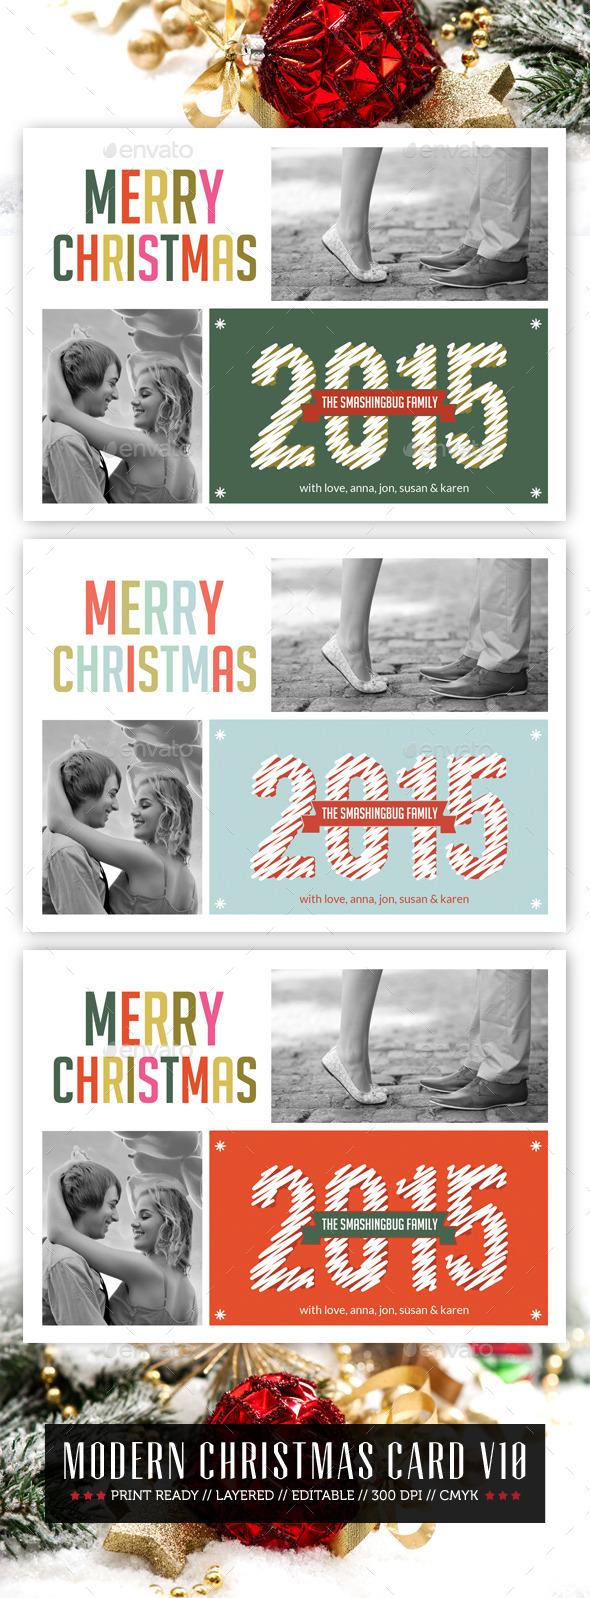 Modern Christmas Card V10 - Holiday Greeting Cards